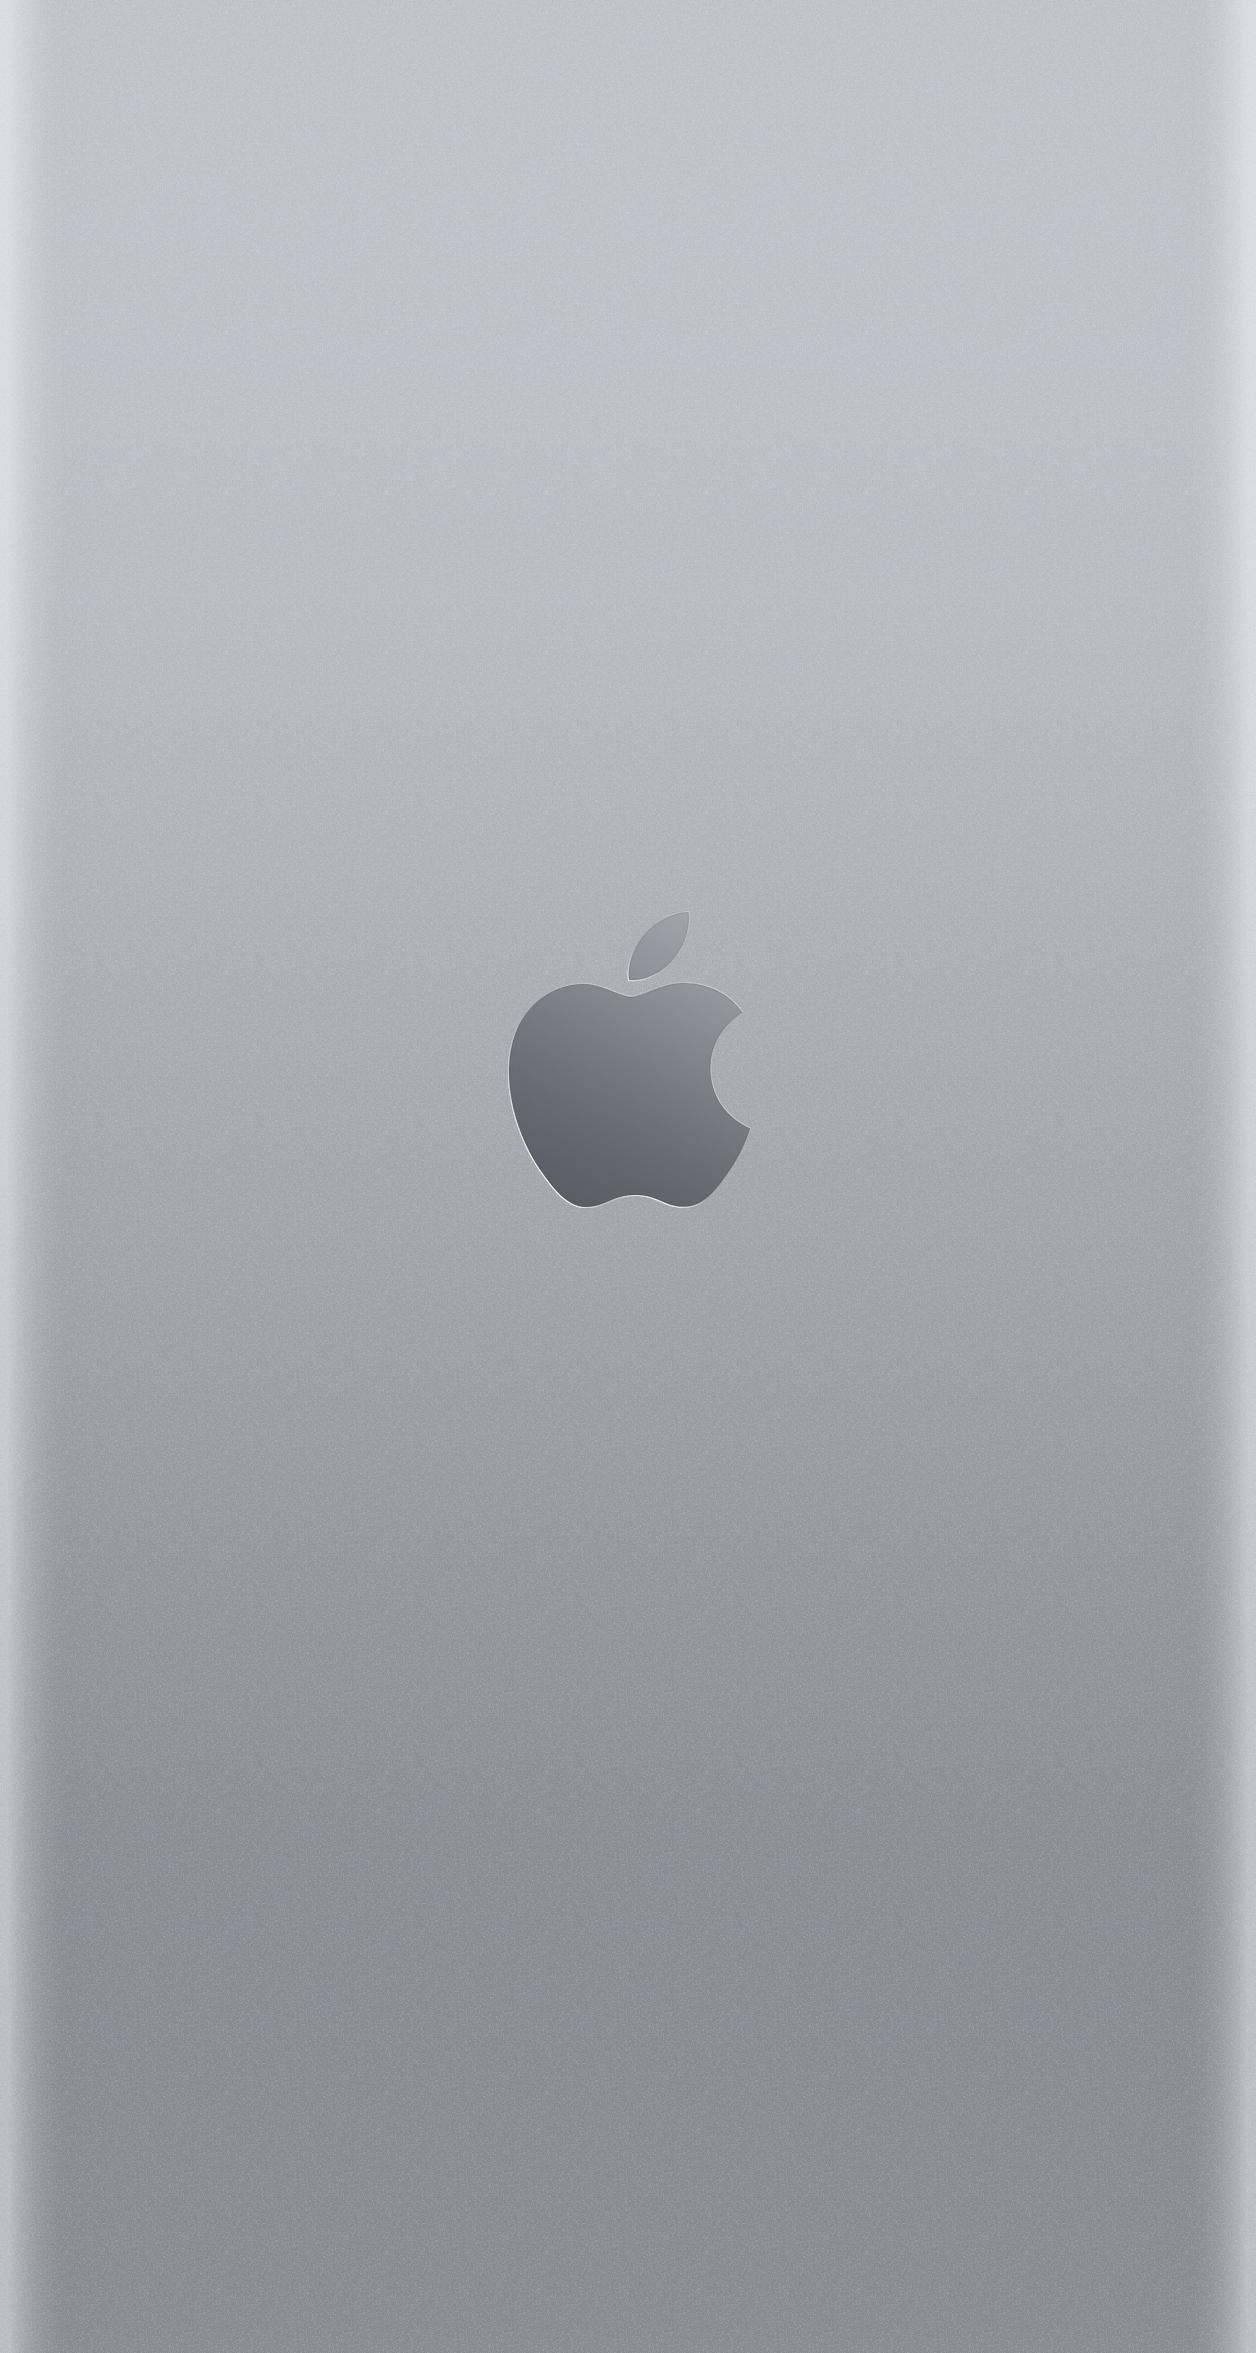 Space Gray iPhone 6 Plus iPhone 6 iPhone 5s idownloadblogcom 1256x2353